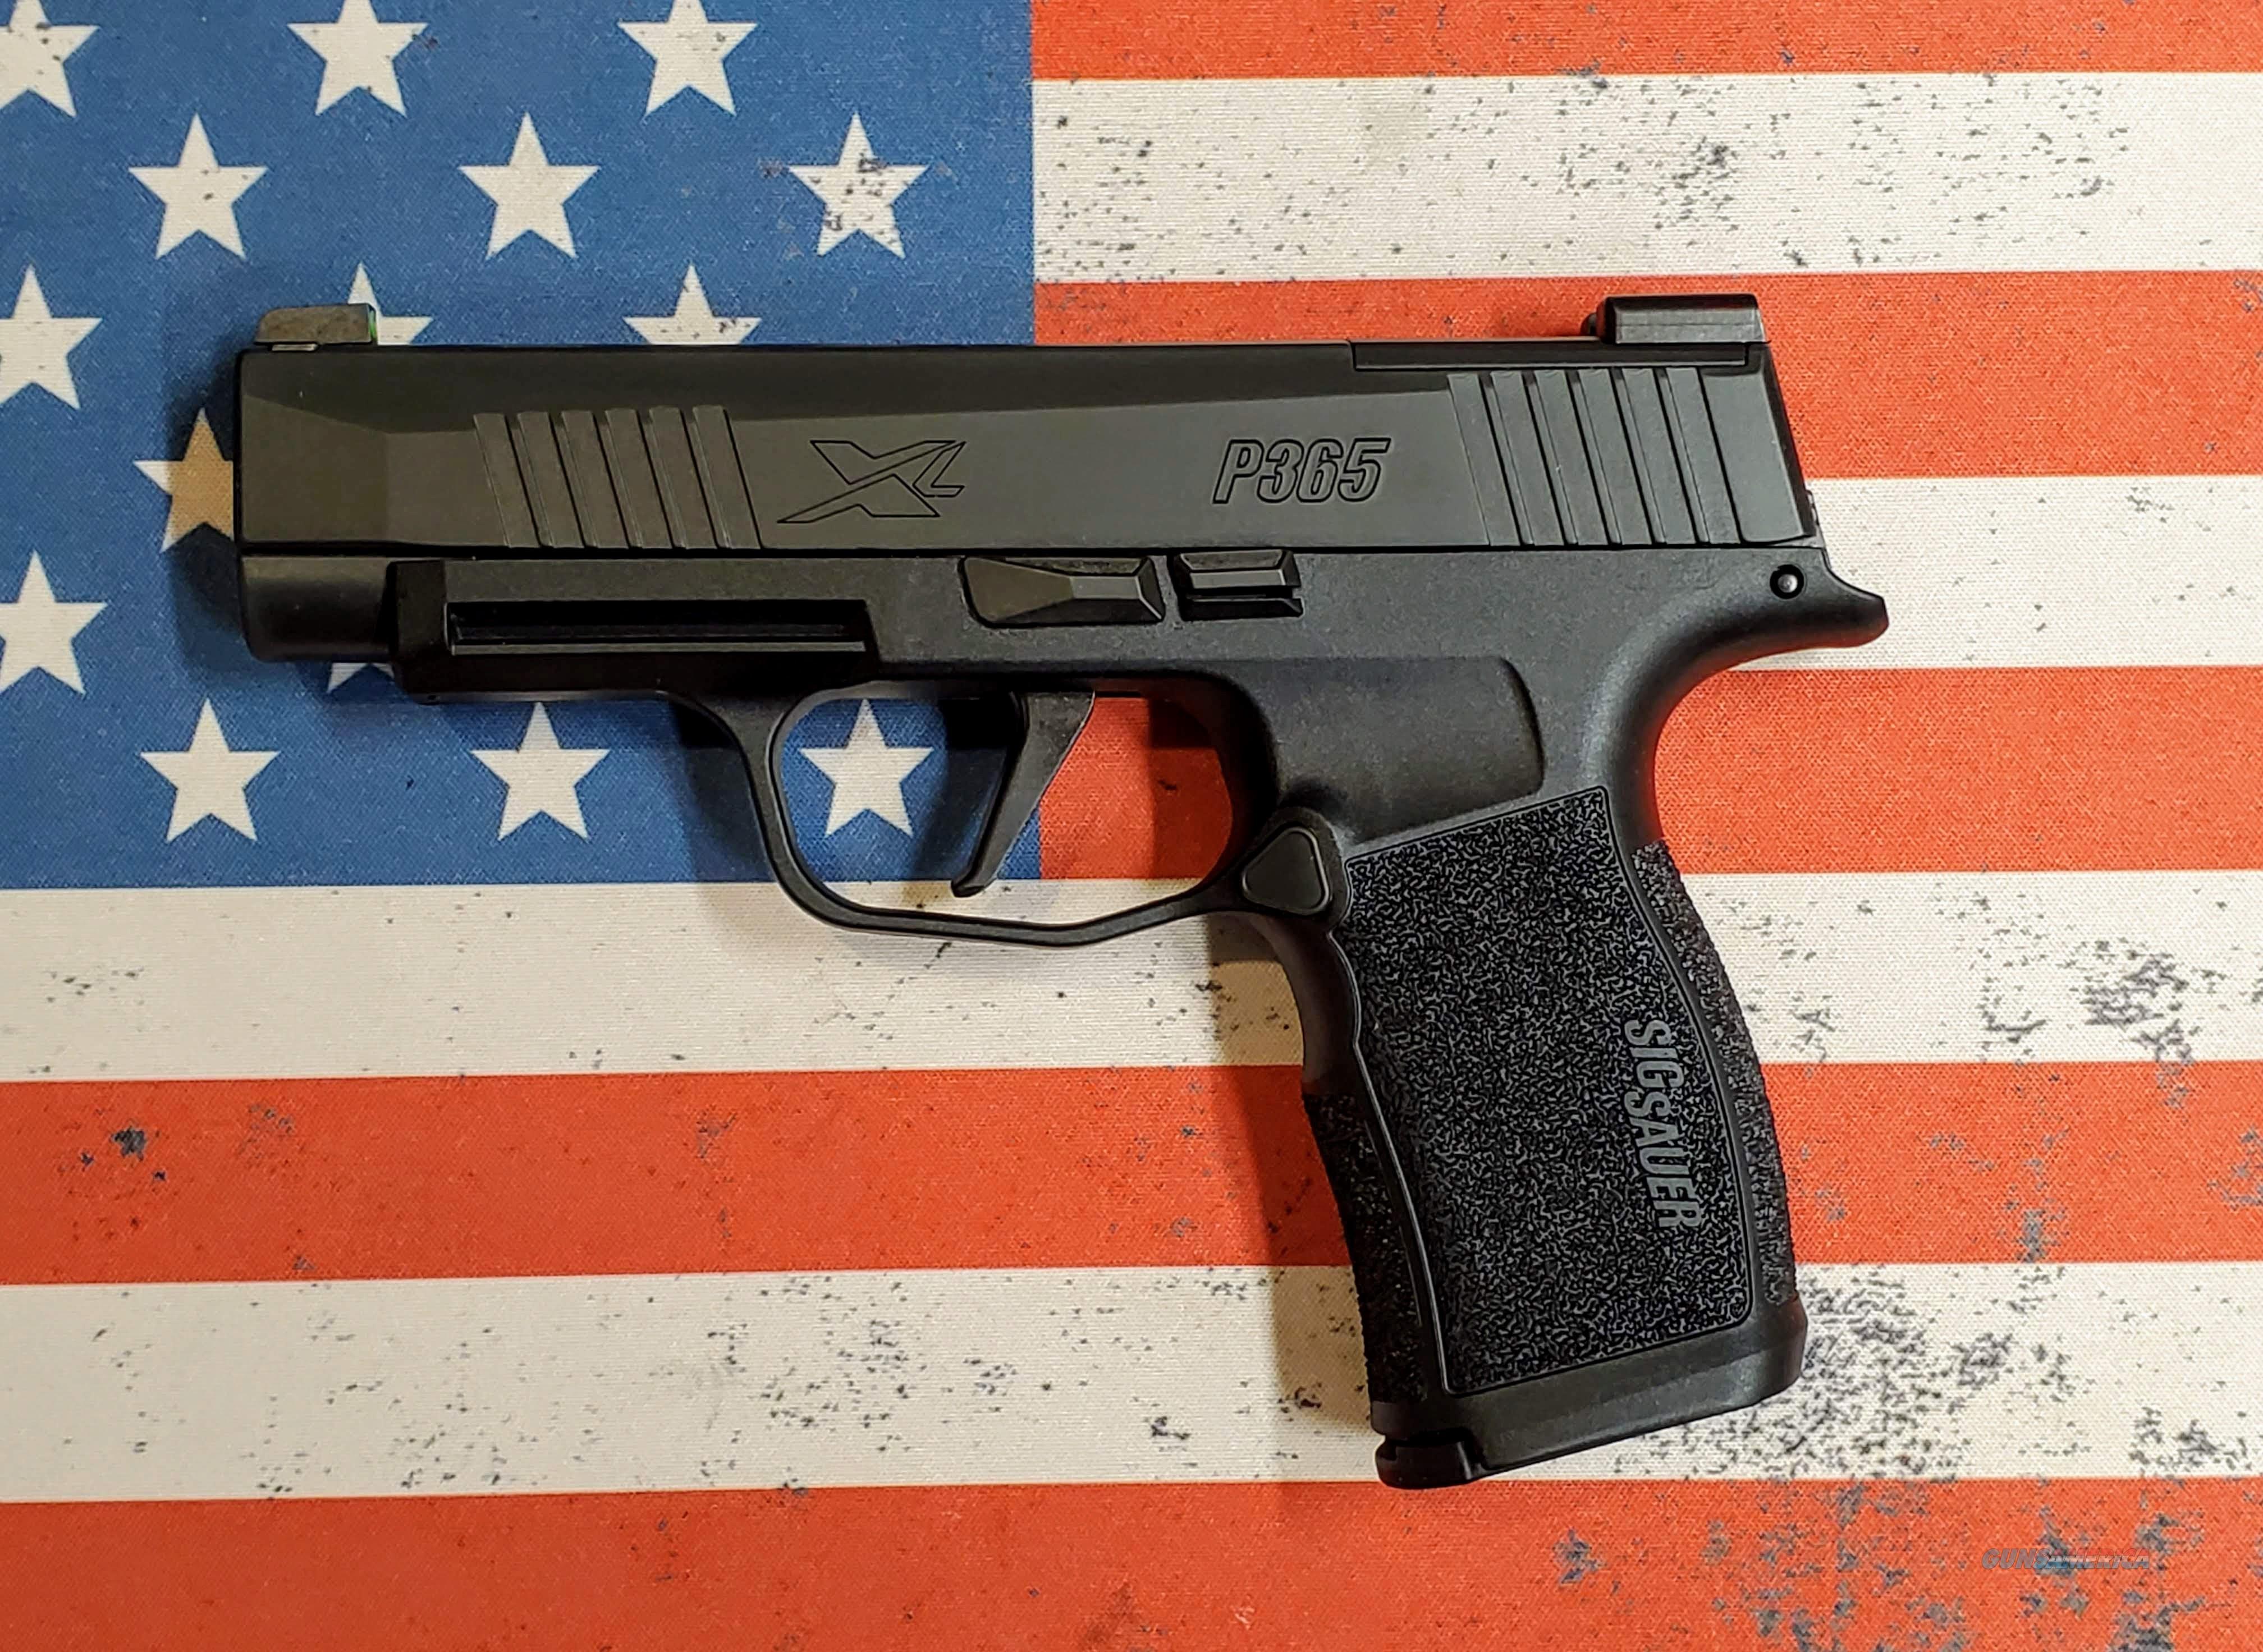 SIG SAUER P365XL 9MM 12+1 **FREE SHIPPING**  Guns > Pistols > Sig - Sauer/Sigarms Pistols > P365